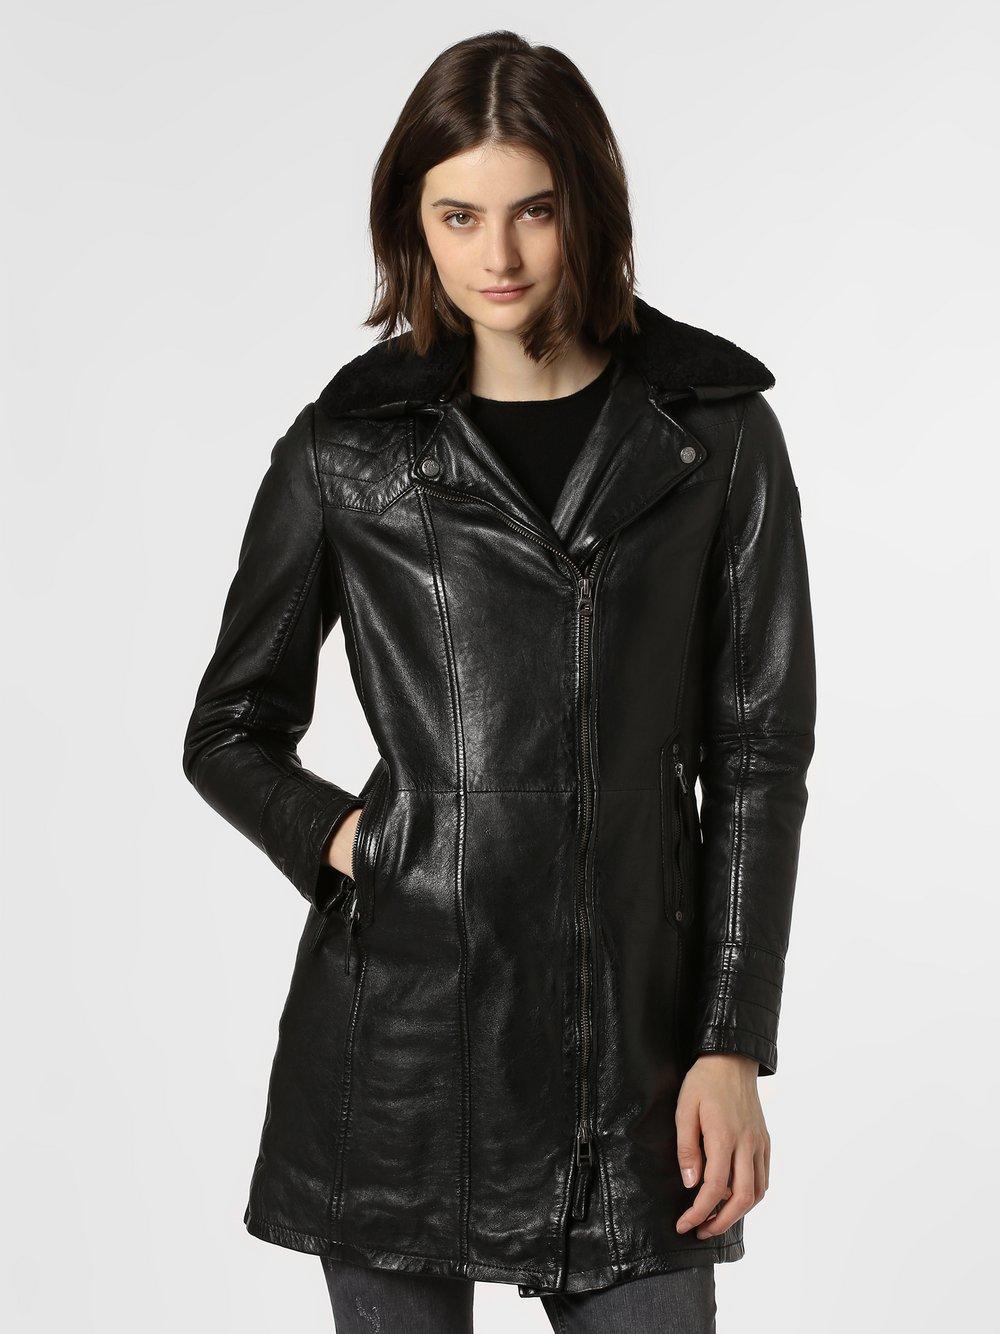 Gipsy – Damska kurtka skórzana – Cassia, czarny Van Graaf 450559-0001-09900